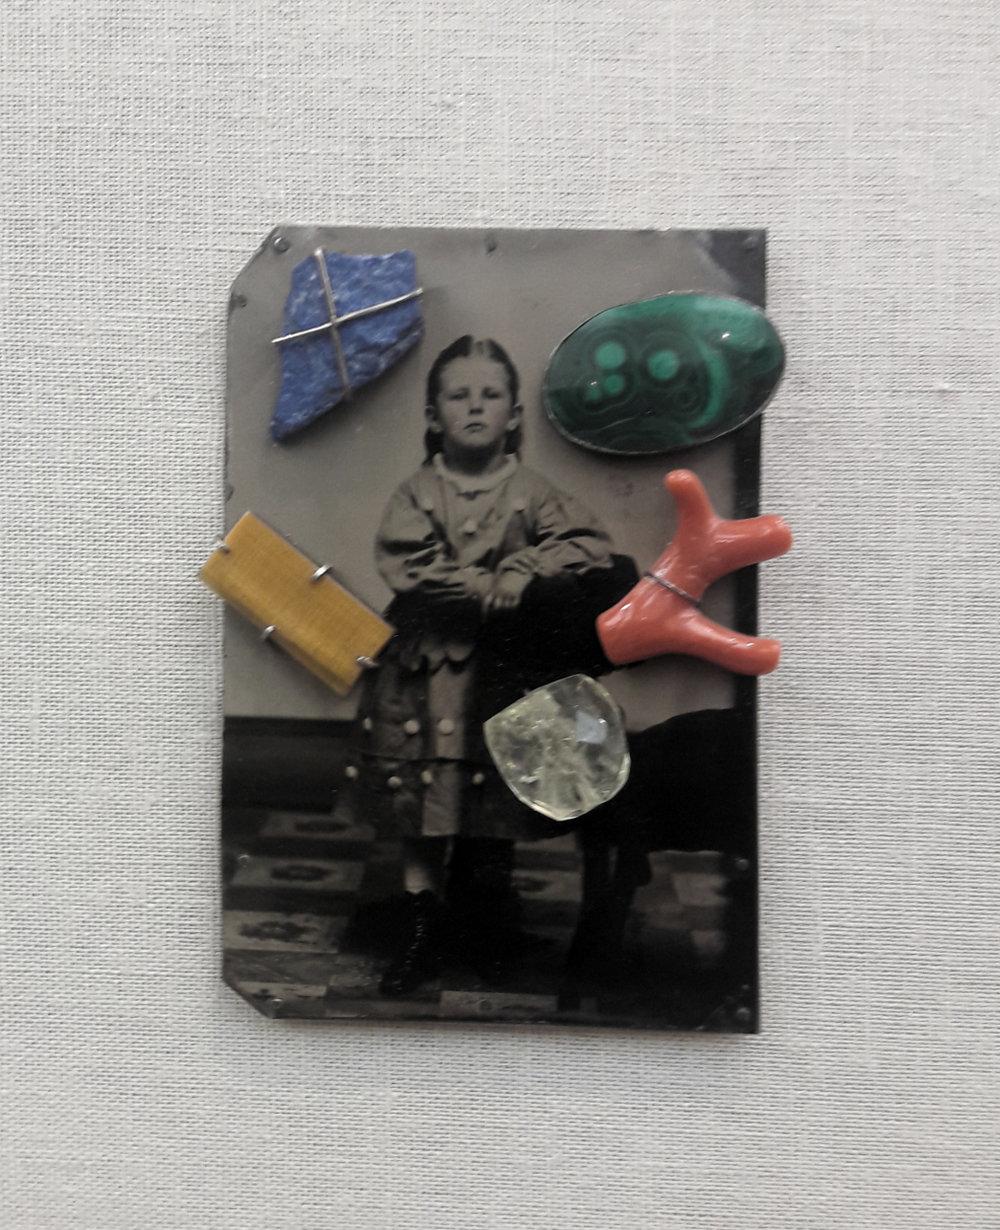 Collect 2018, Gallery SO, Bettina Speckner